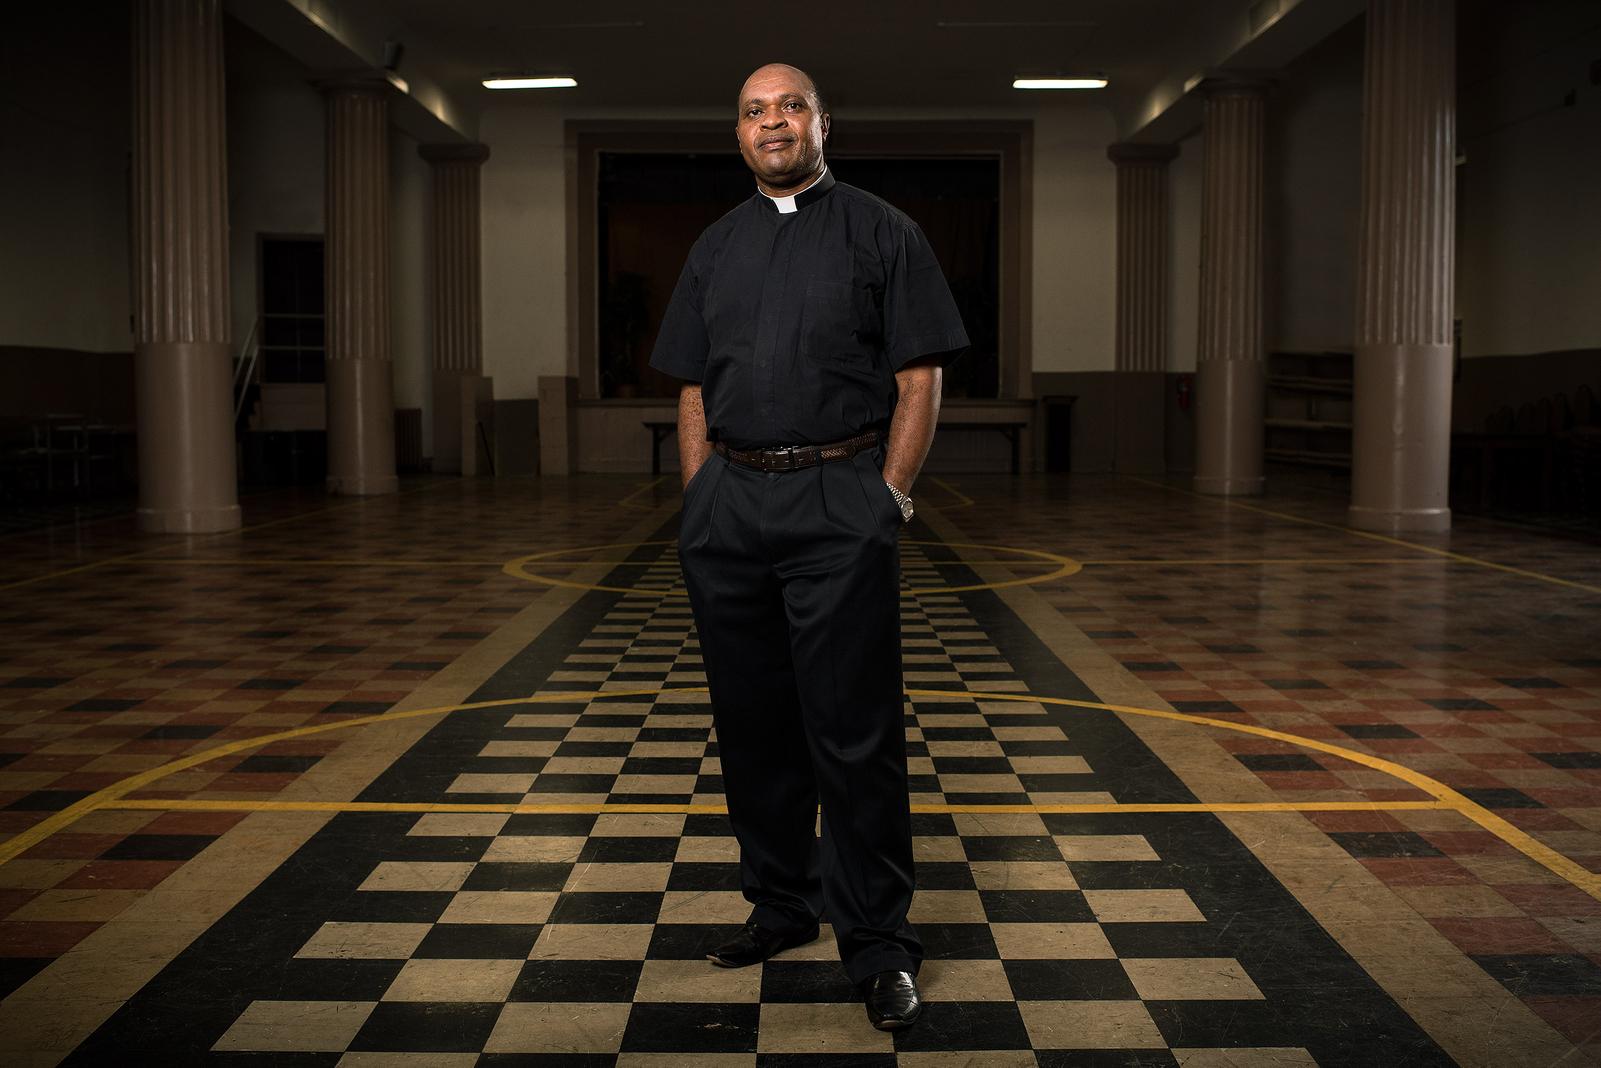 catholic_charities_AA_priest copy.jpg